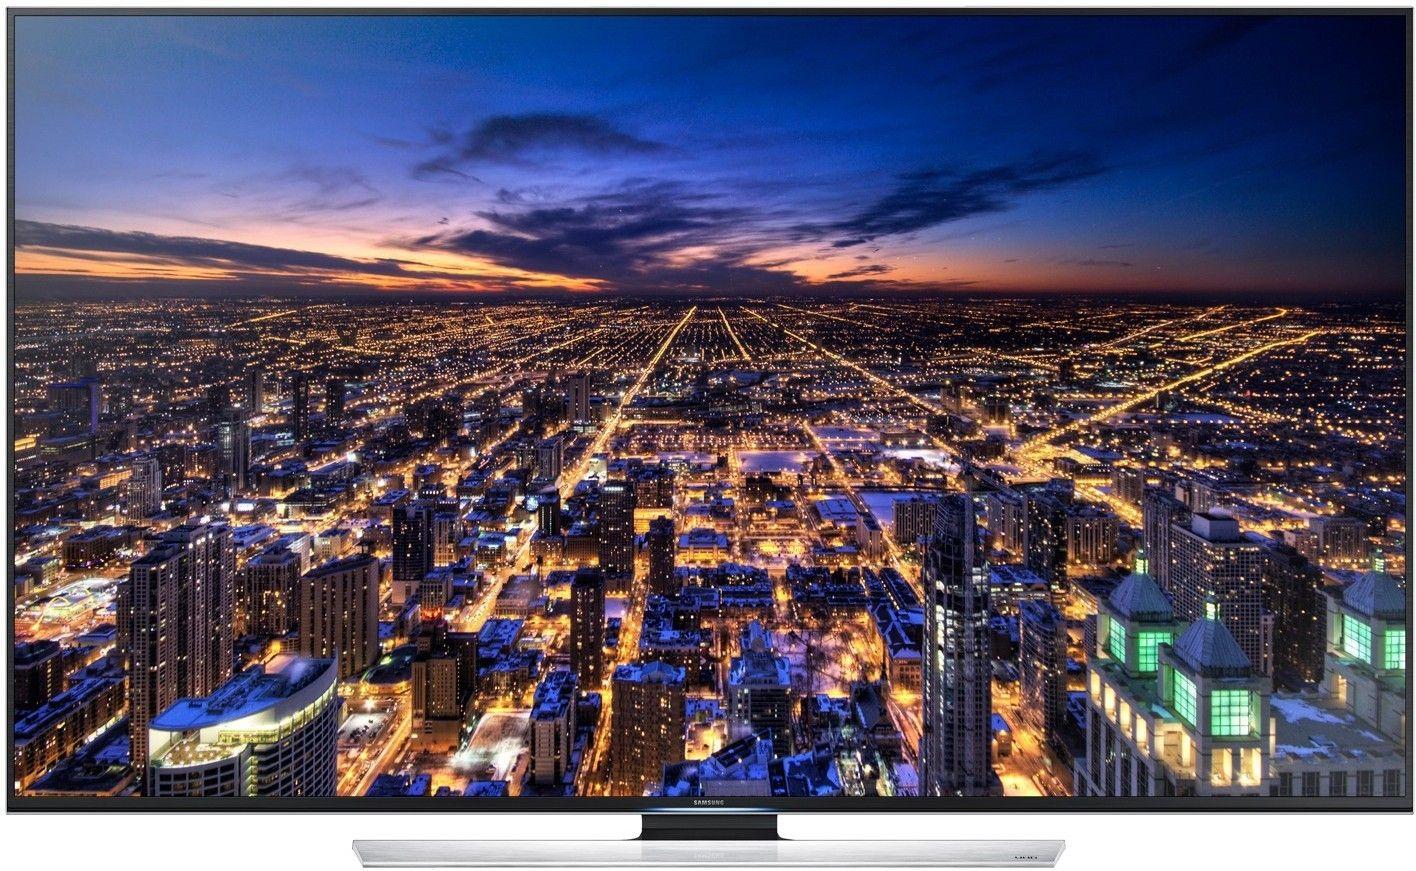 Ikke alle TV-modeller har falt i pris. Denne 85-tommeren fra Samsung har kostet 75 000 kroner de siste tre månedene. .Foto: Samsung